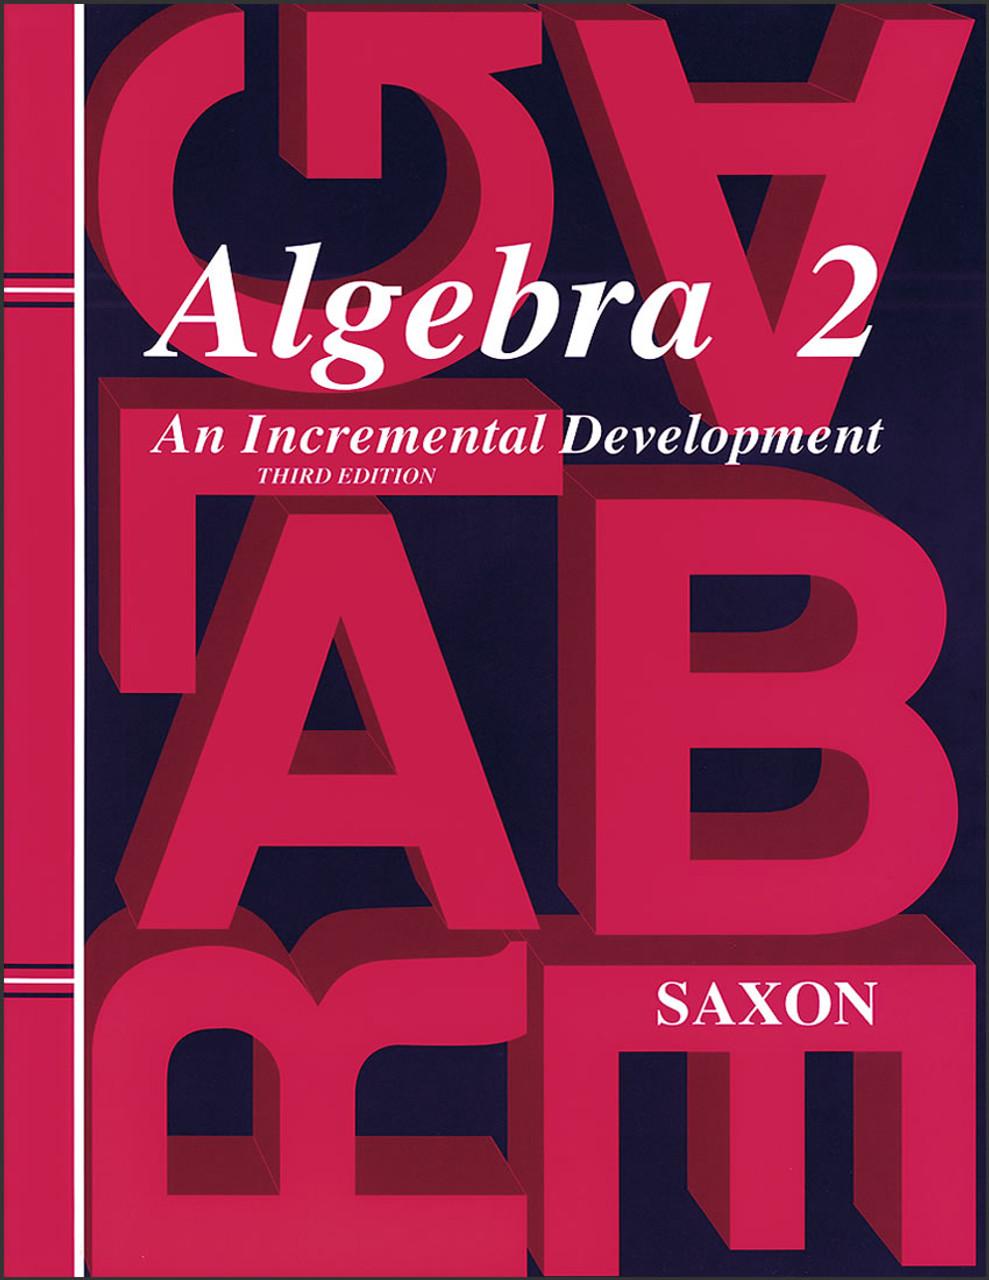 Saxon Algebra 2, 3rd edition - Home Study Kit